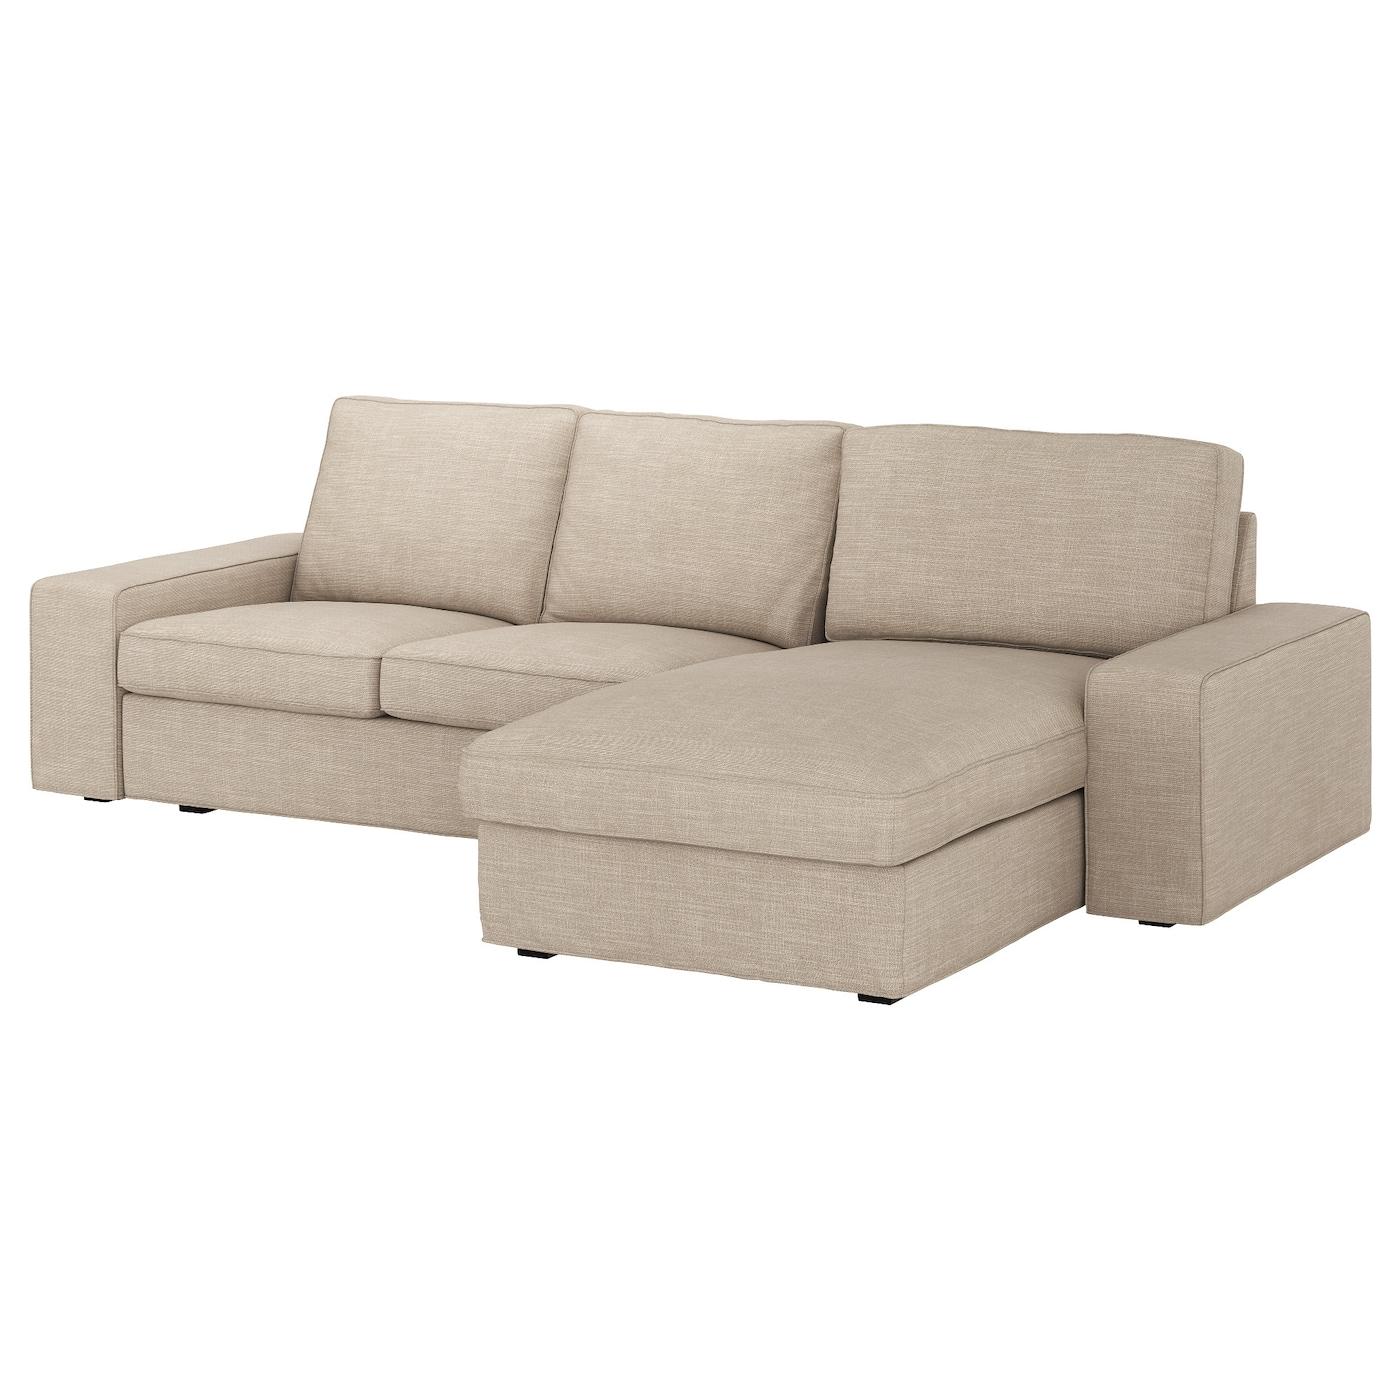 Three Seater Sofas | IKEA Ireland - Dublin